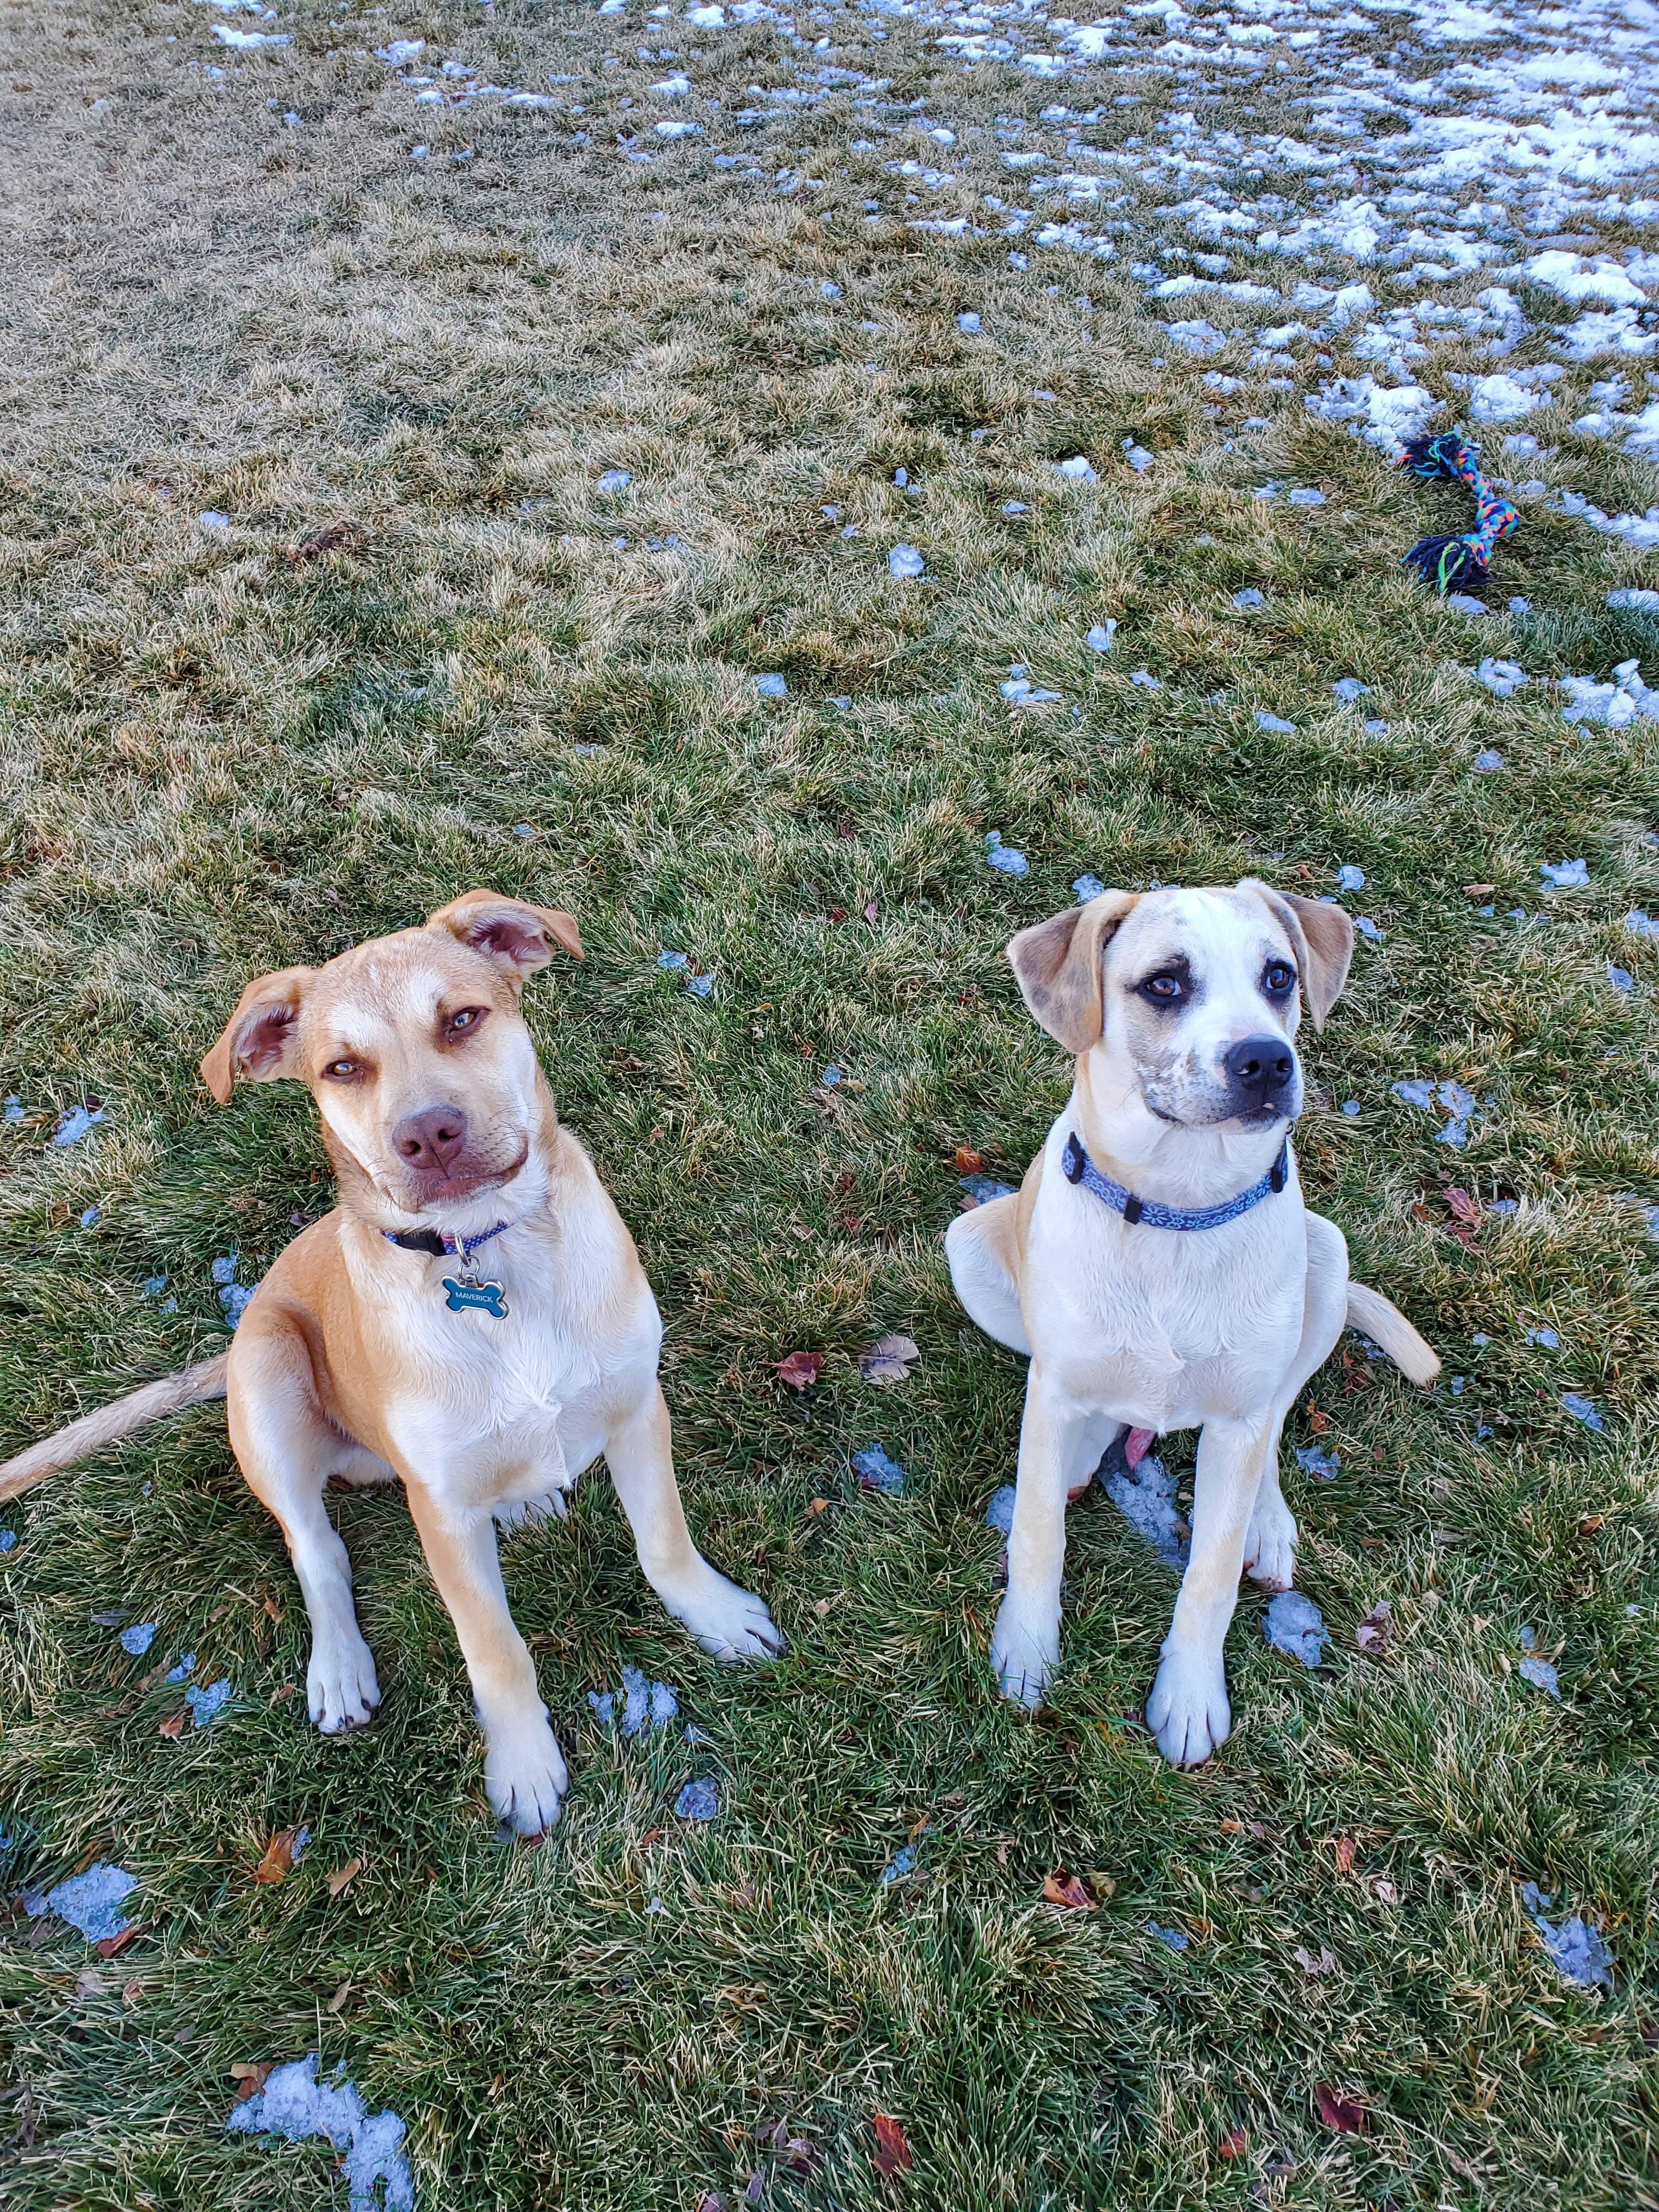 cj-affiliate-2021-pets-tucker-gitlin-maverick-and-goose